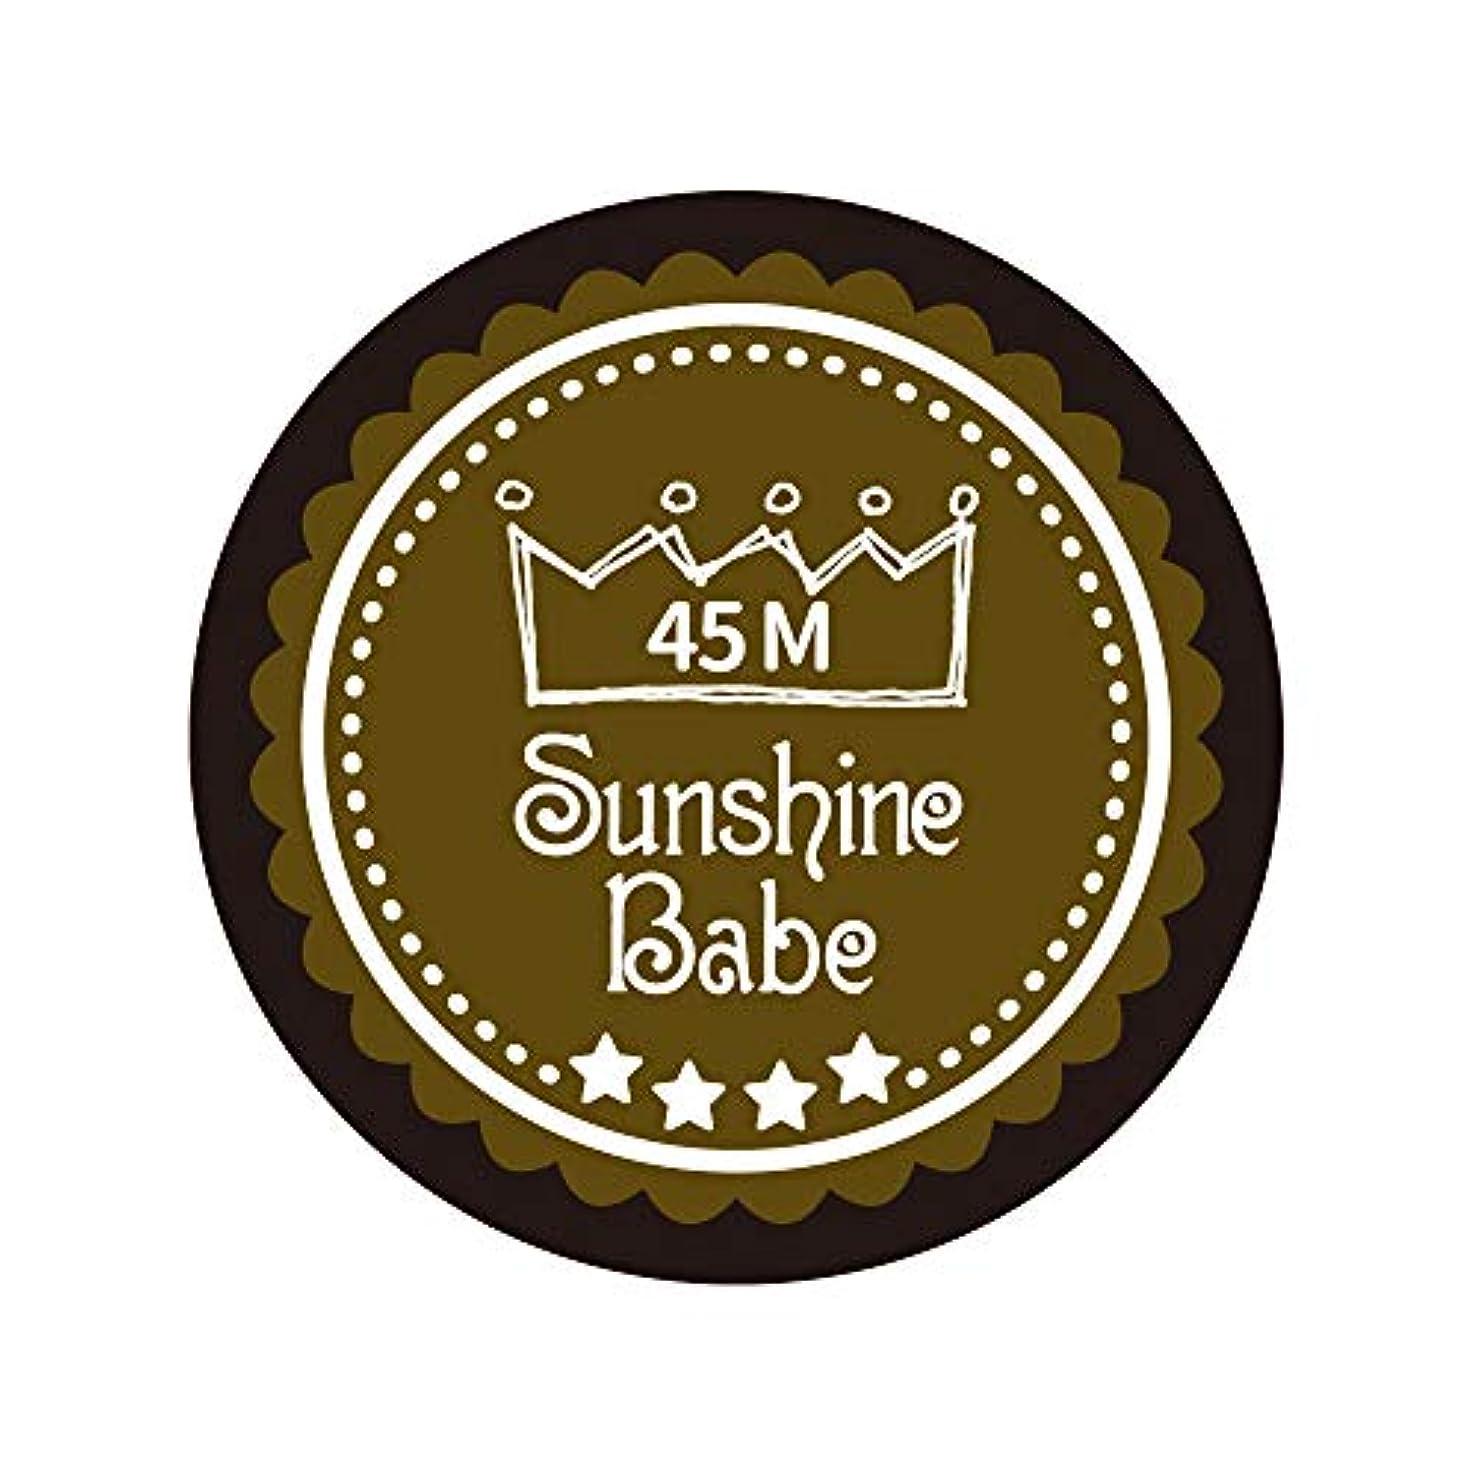 Sunshine Babe カラージェル 45M マティーニオリーブ 2.7g UV/LED対応